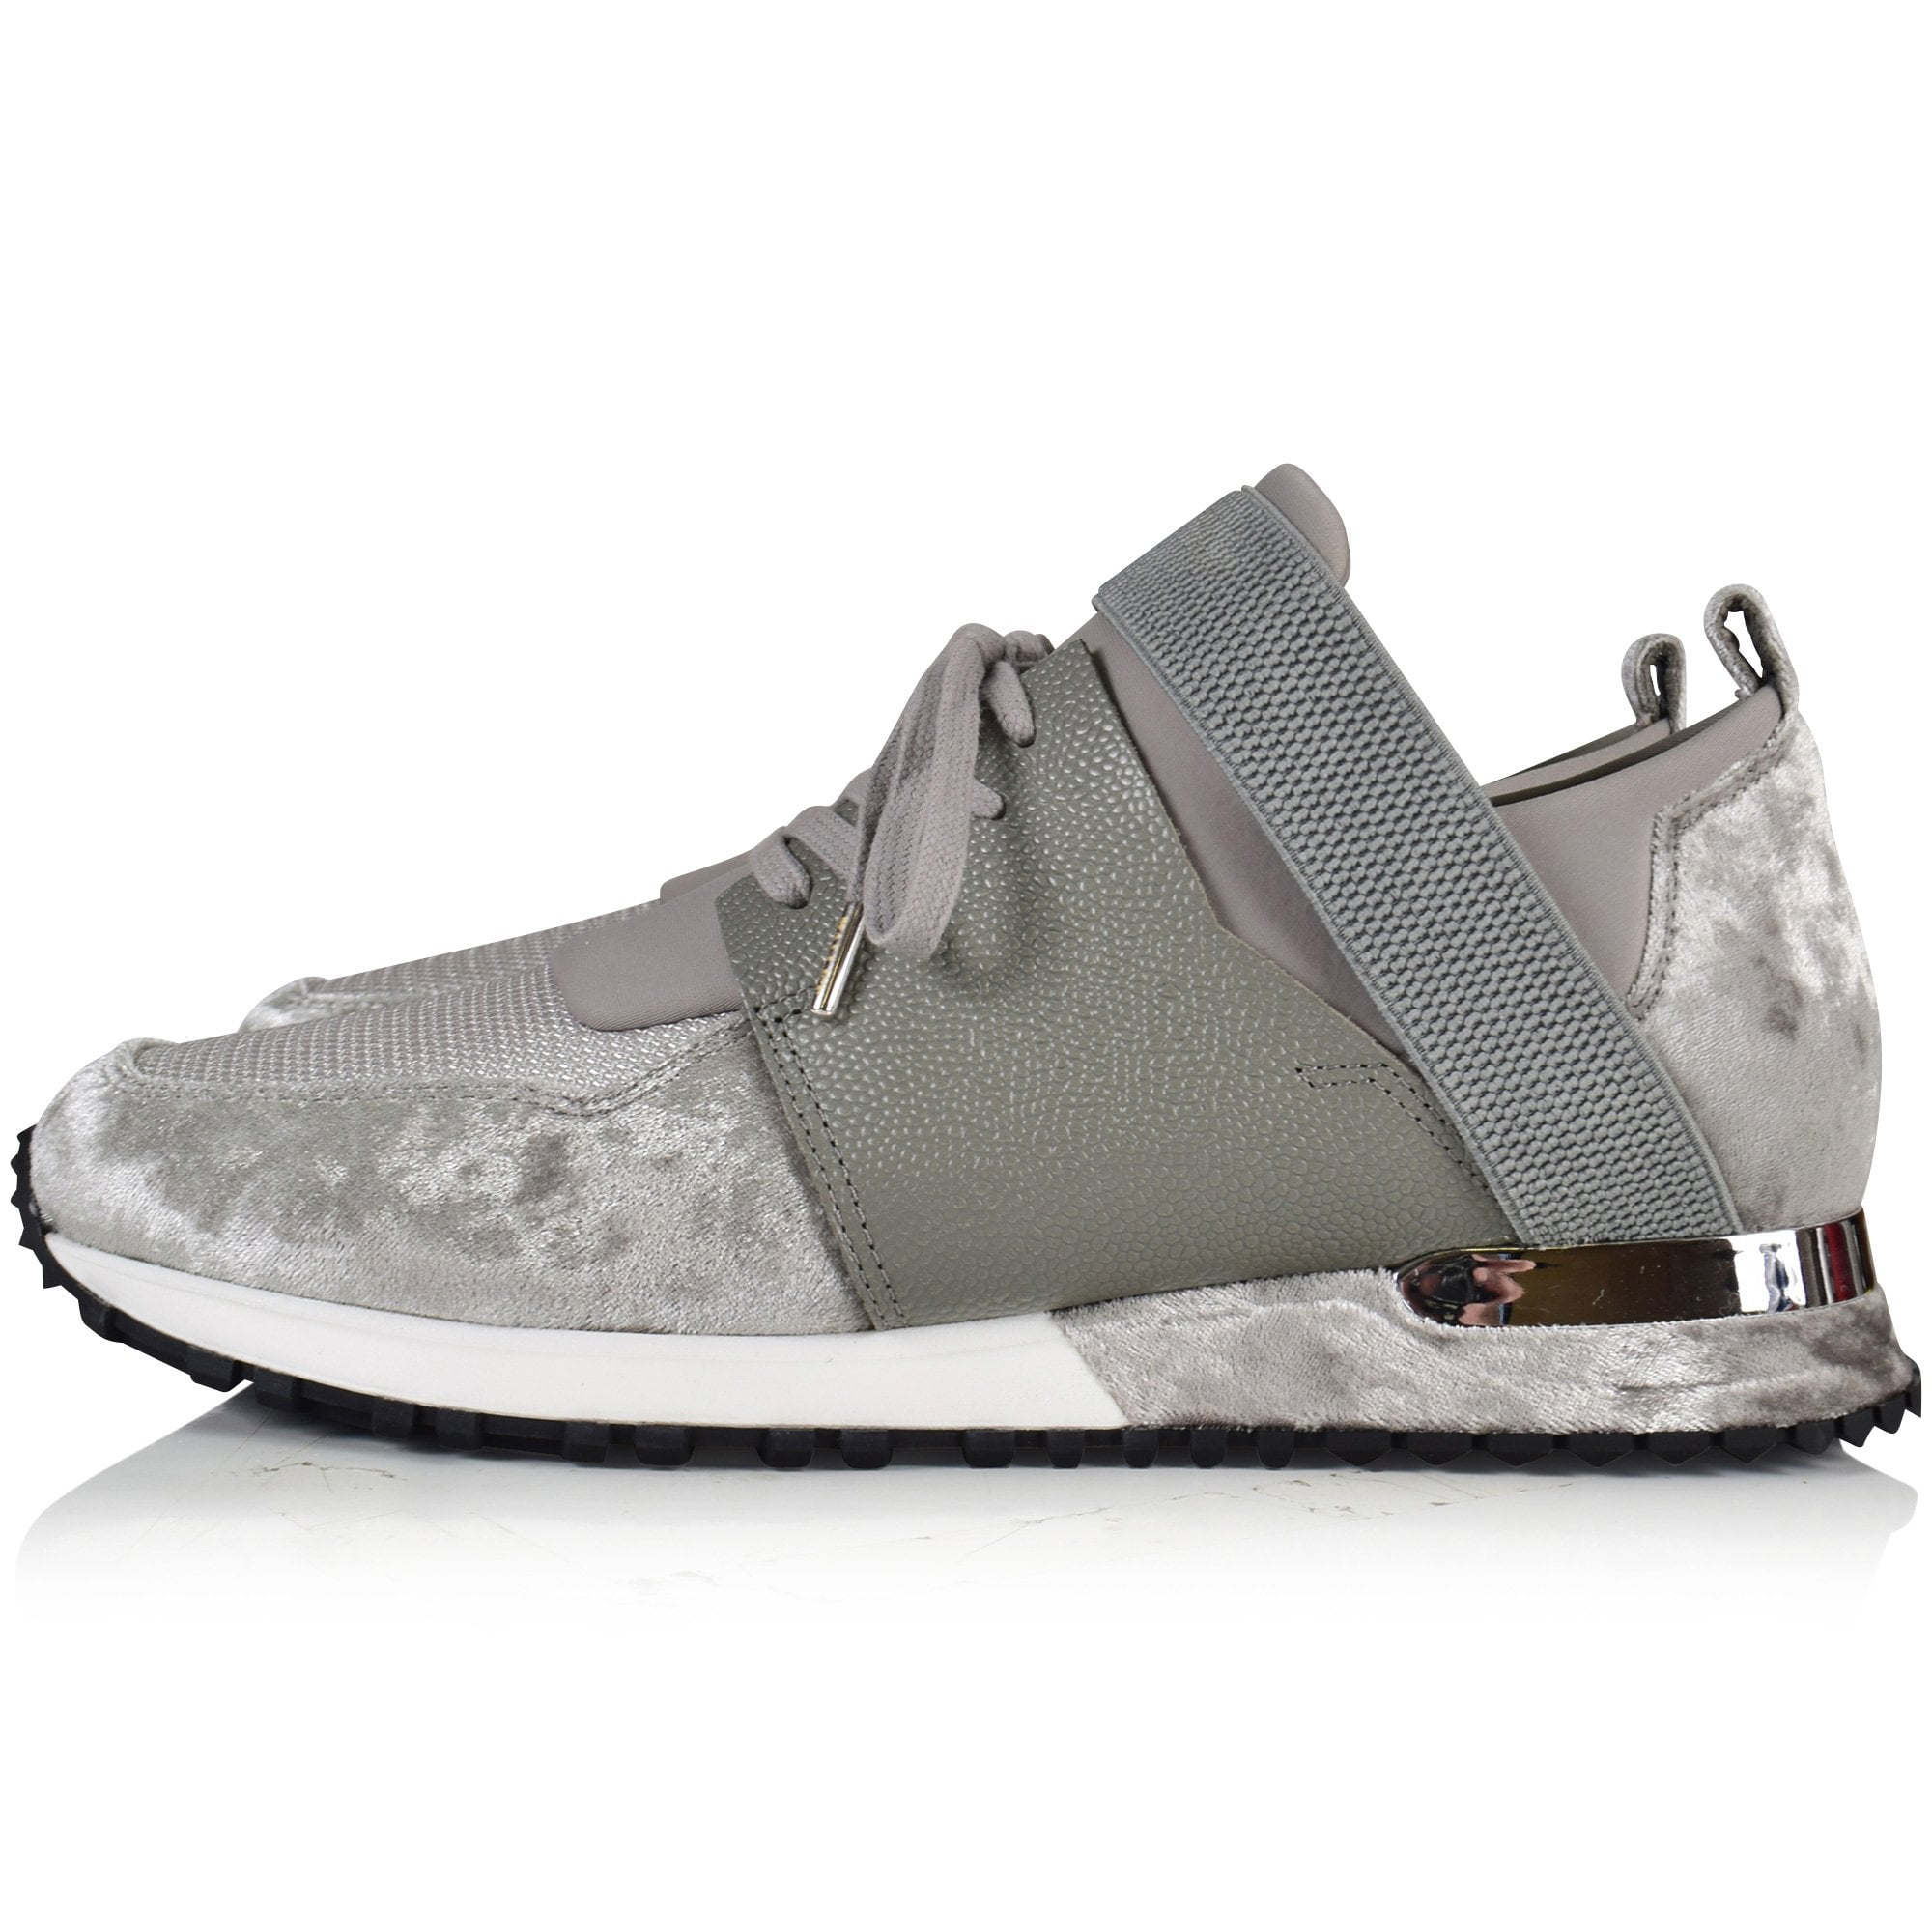 MALLET FOOTWEAR Grey Velvet Elast